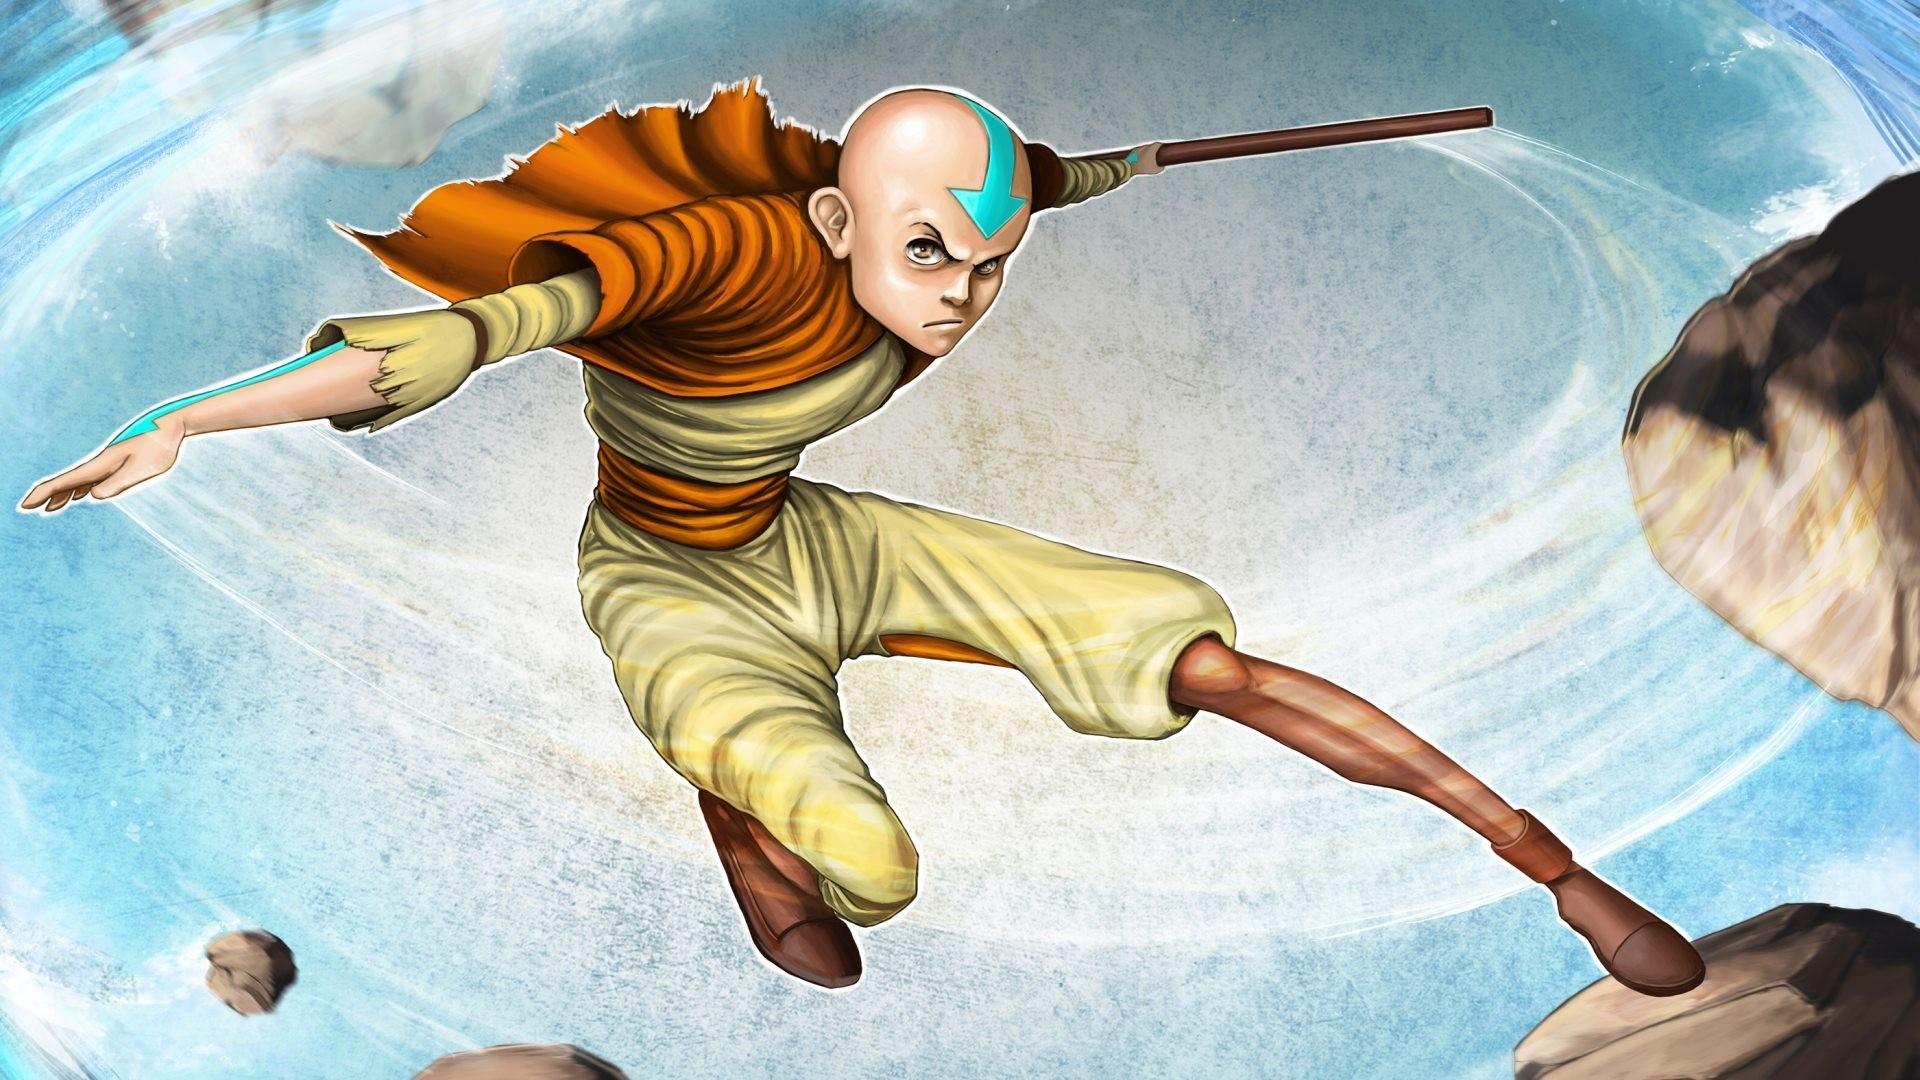 Avatar The Last Airbender Wallpaper image hd